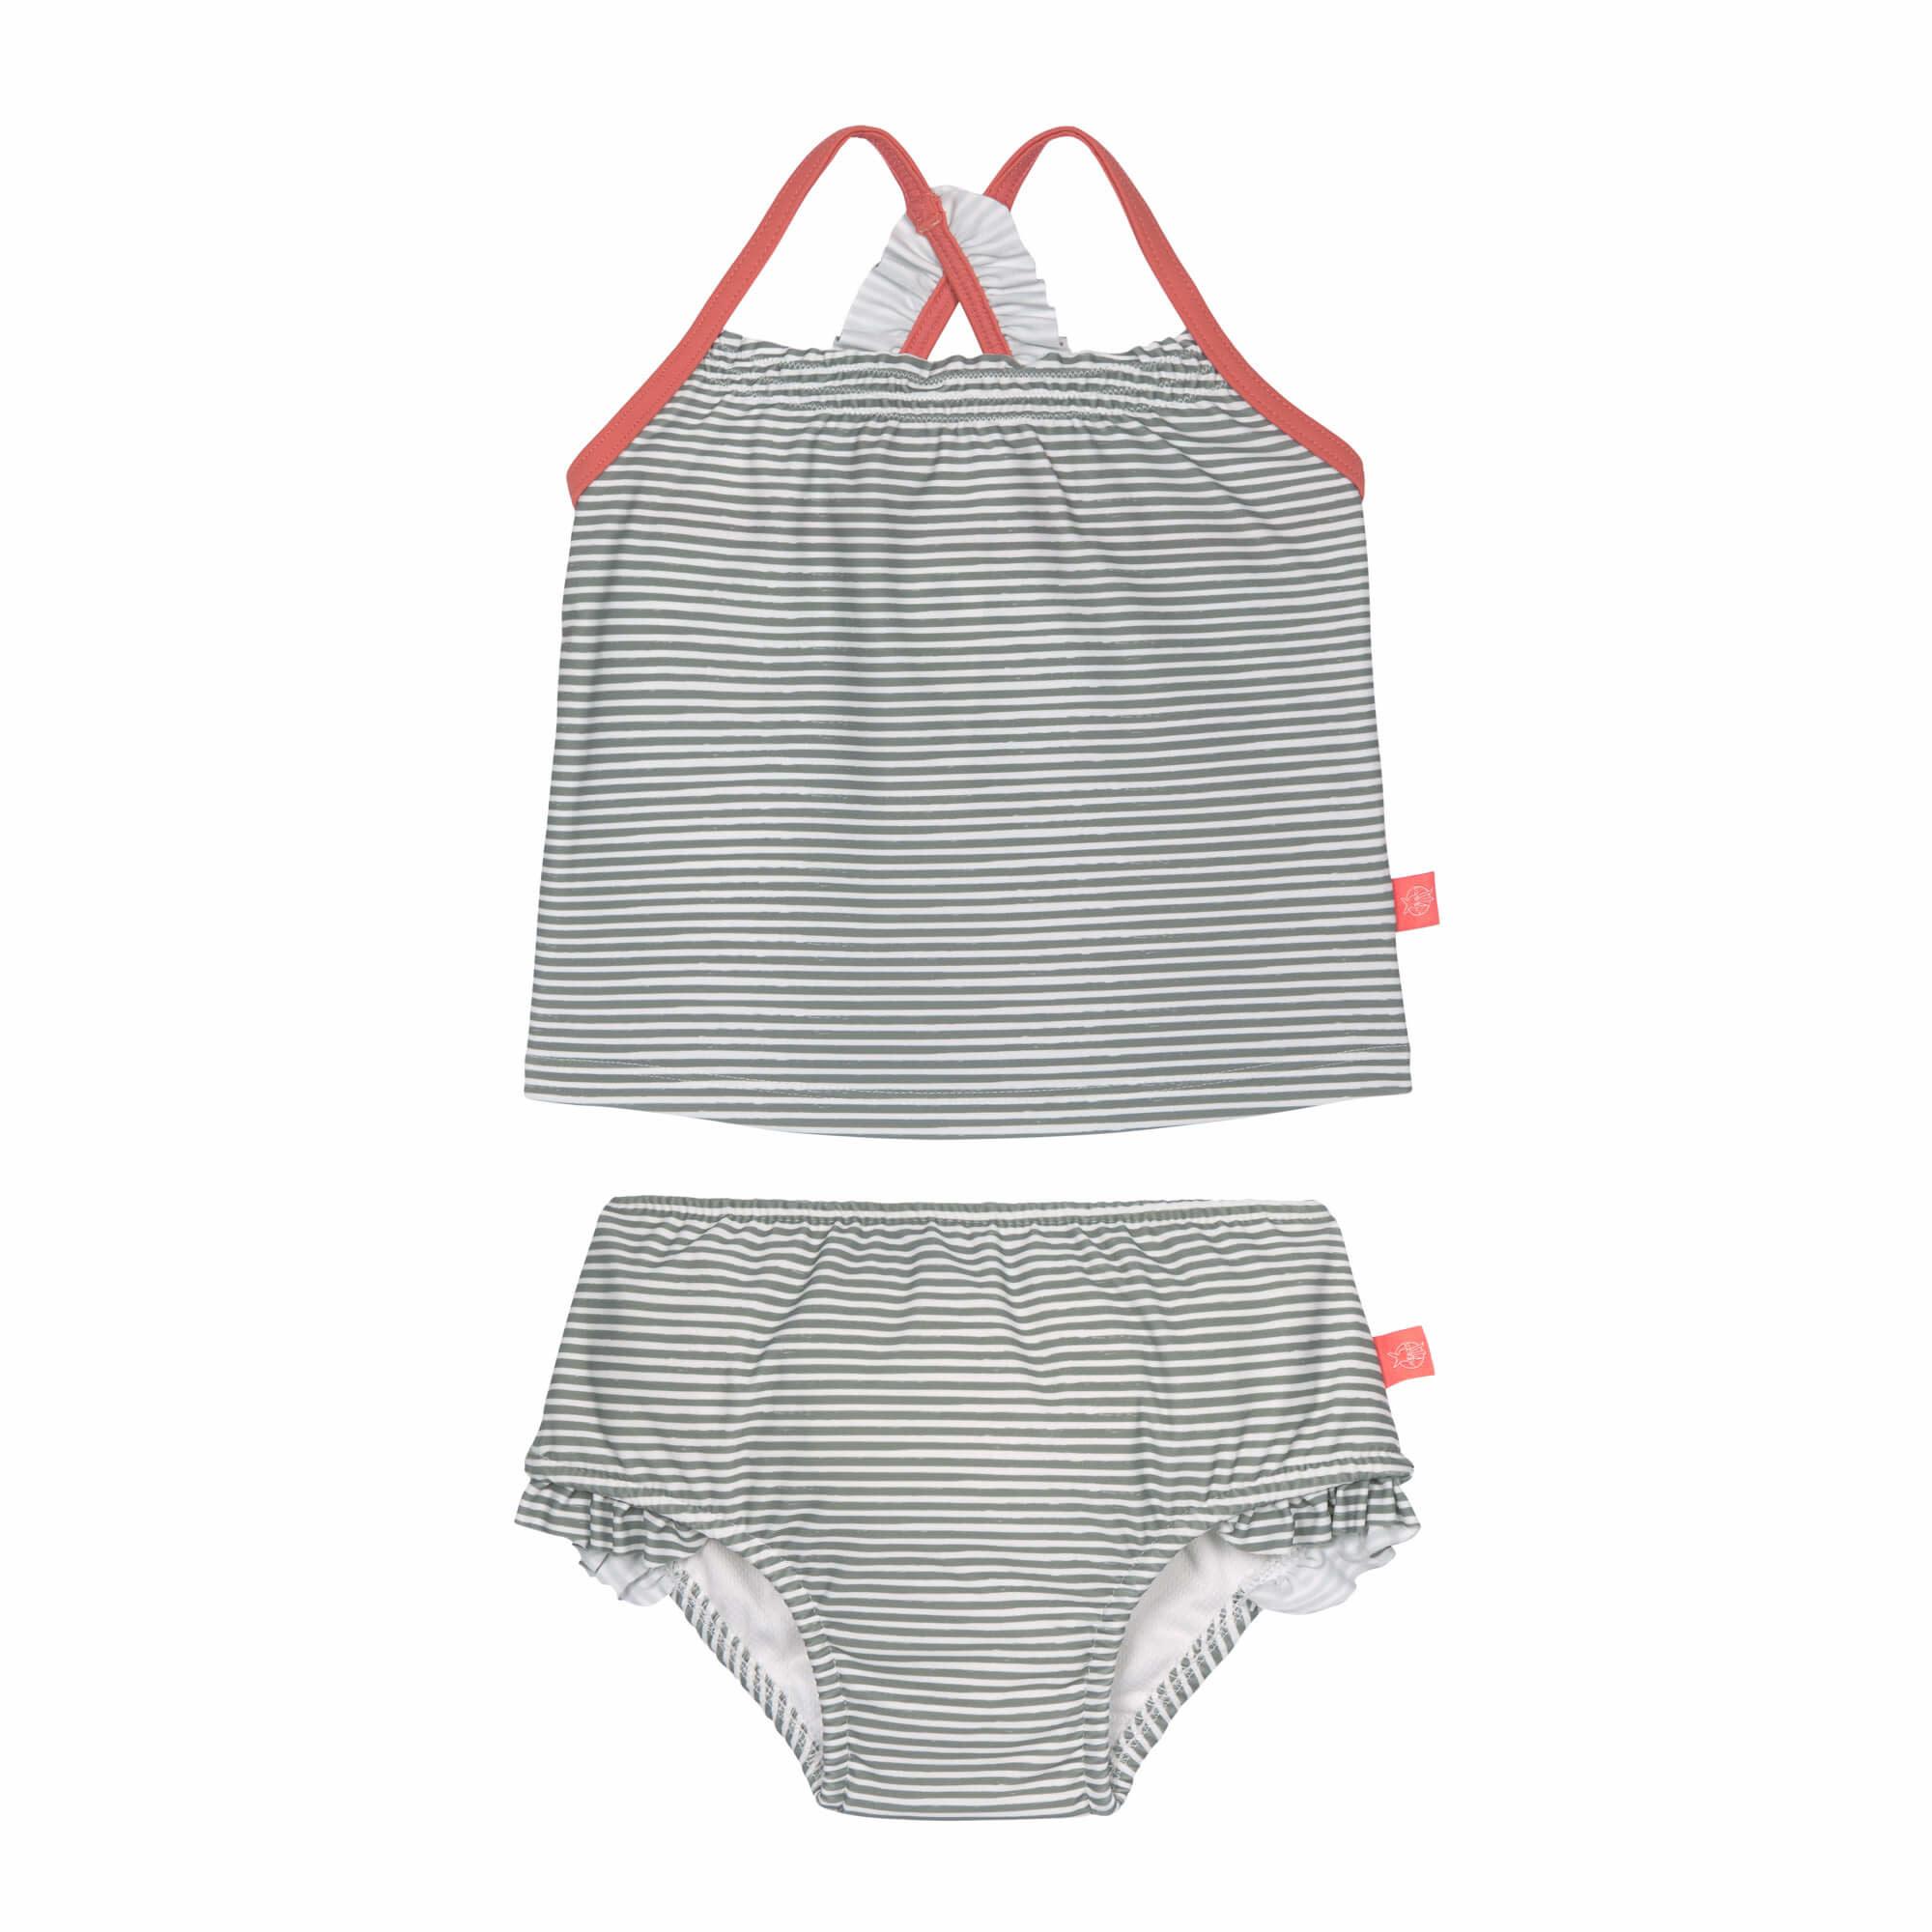 Lassig Tankini Set Girl Striped Coral